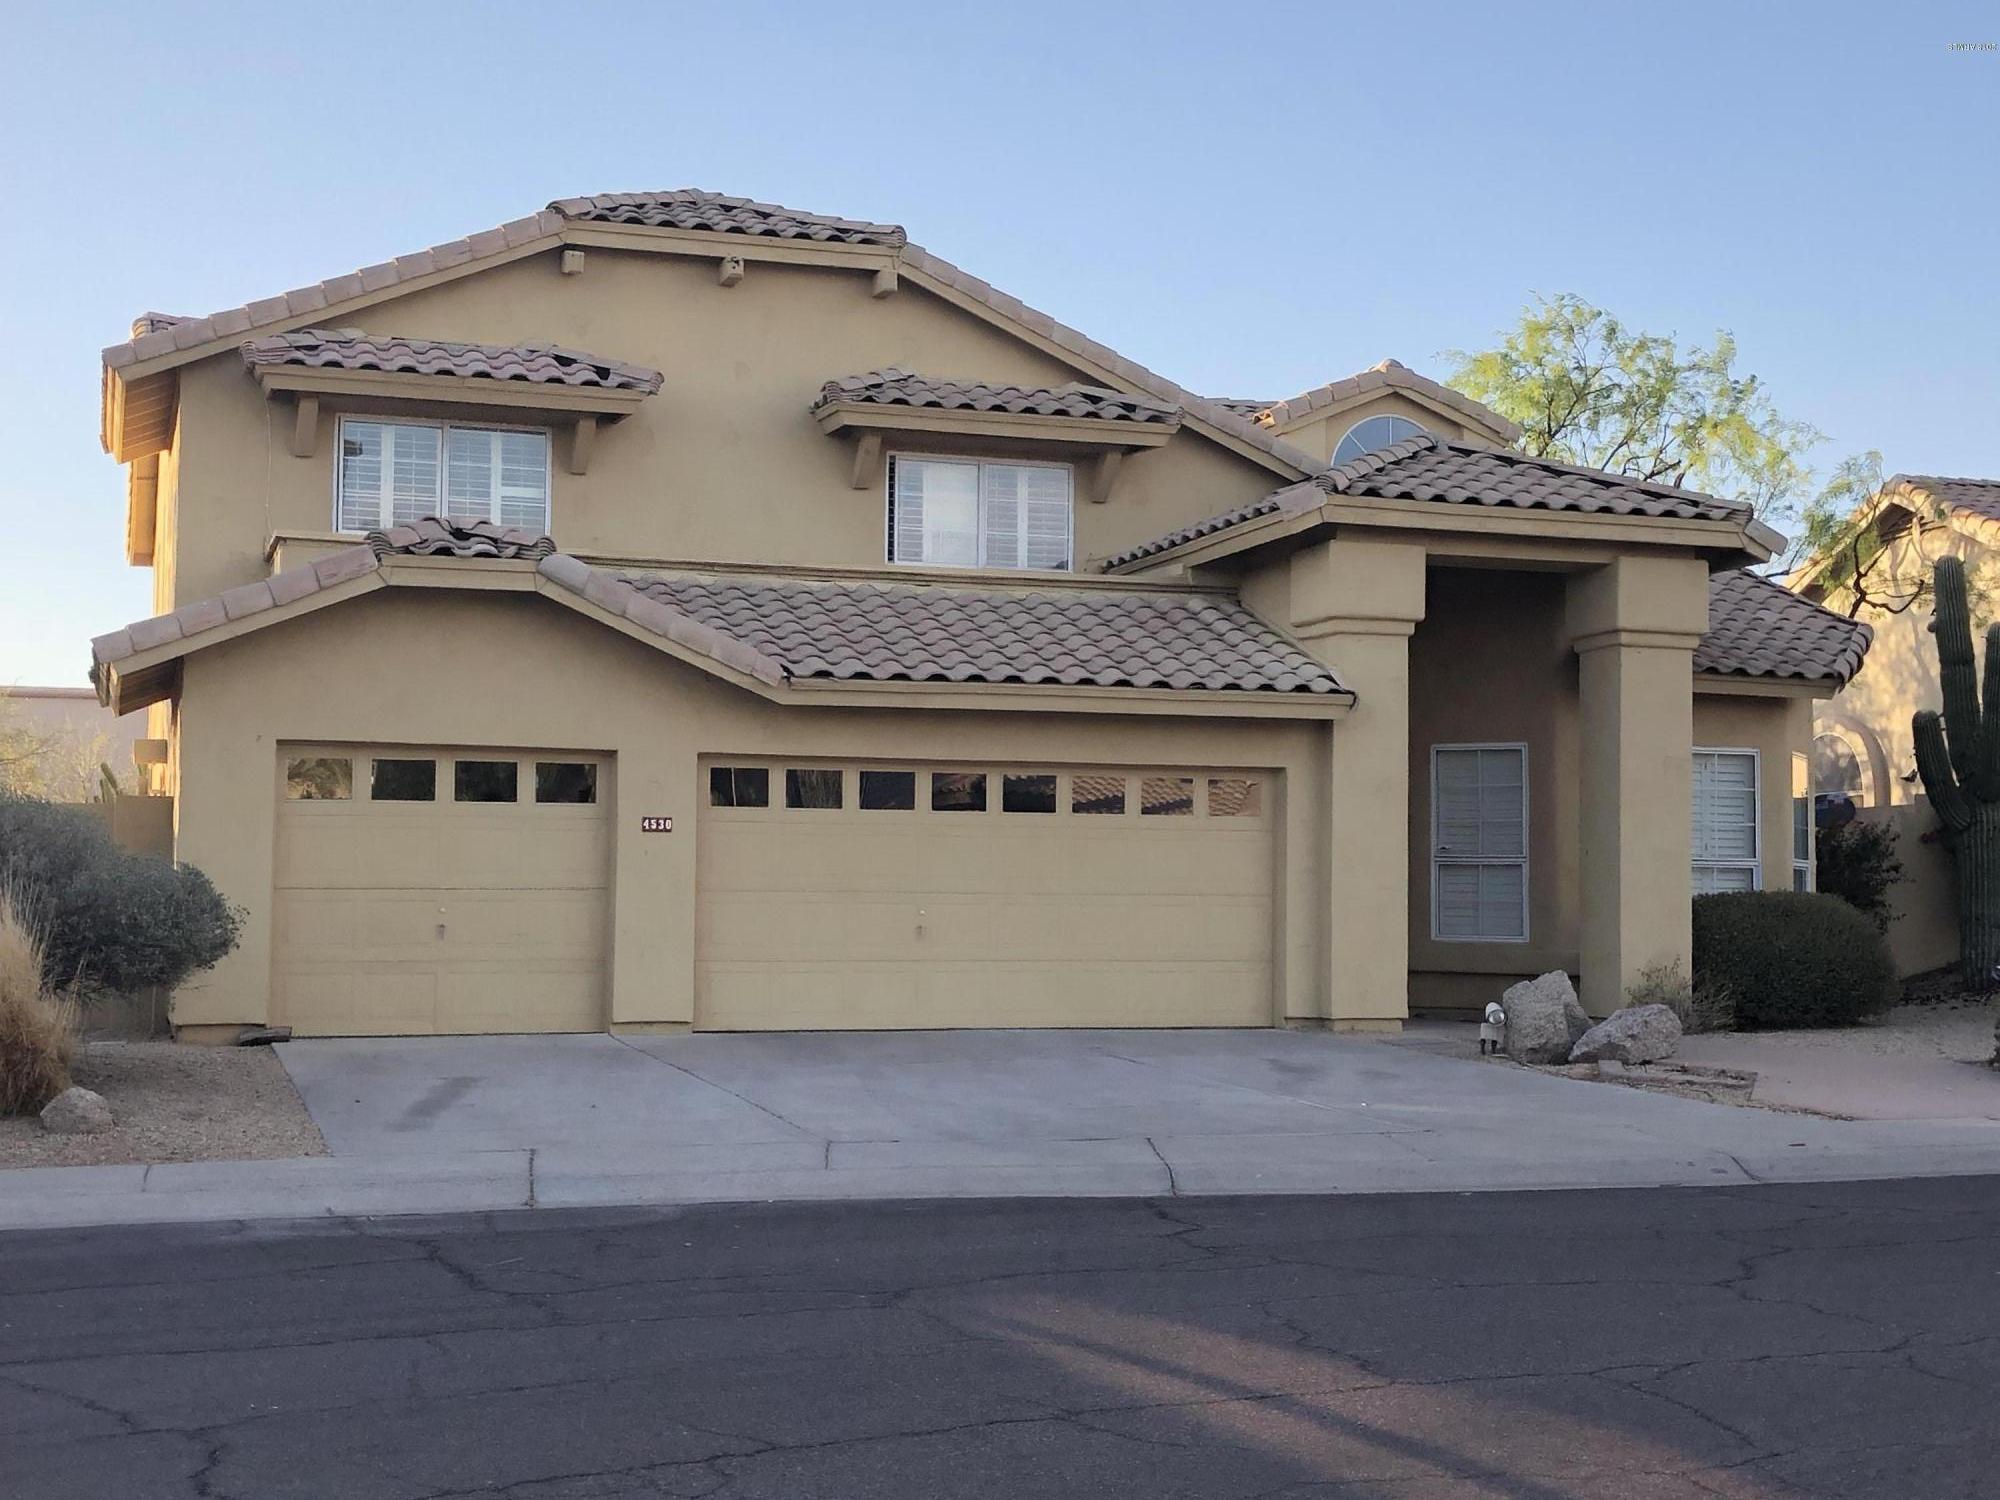 Photo for 4530 E Rancho Laredo Drive, Cave Creek, AZ 85331 (MLS # 6129760)